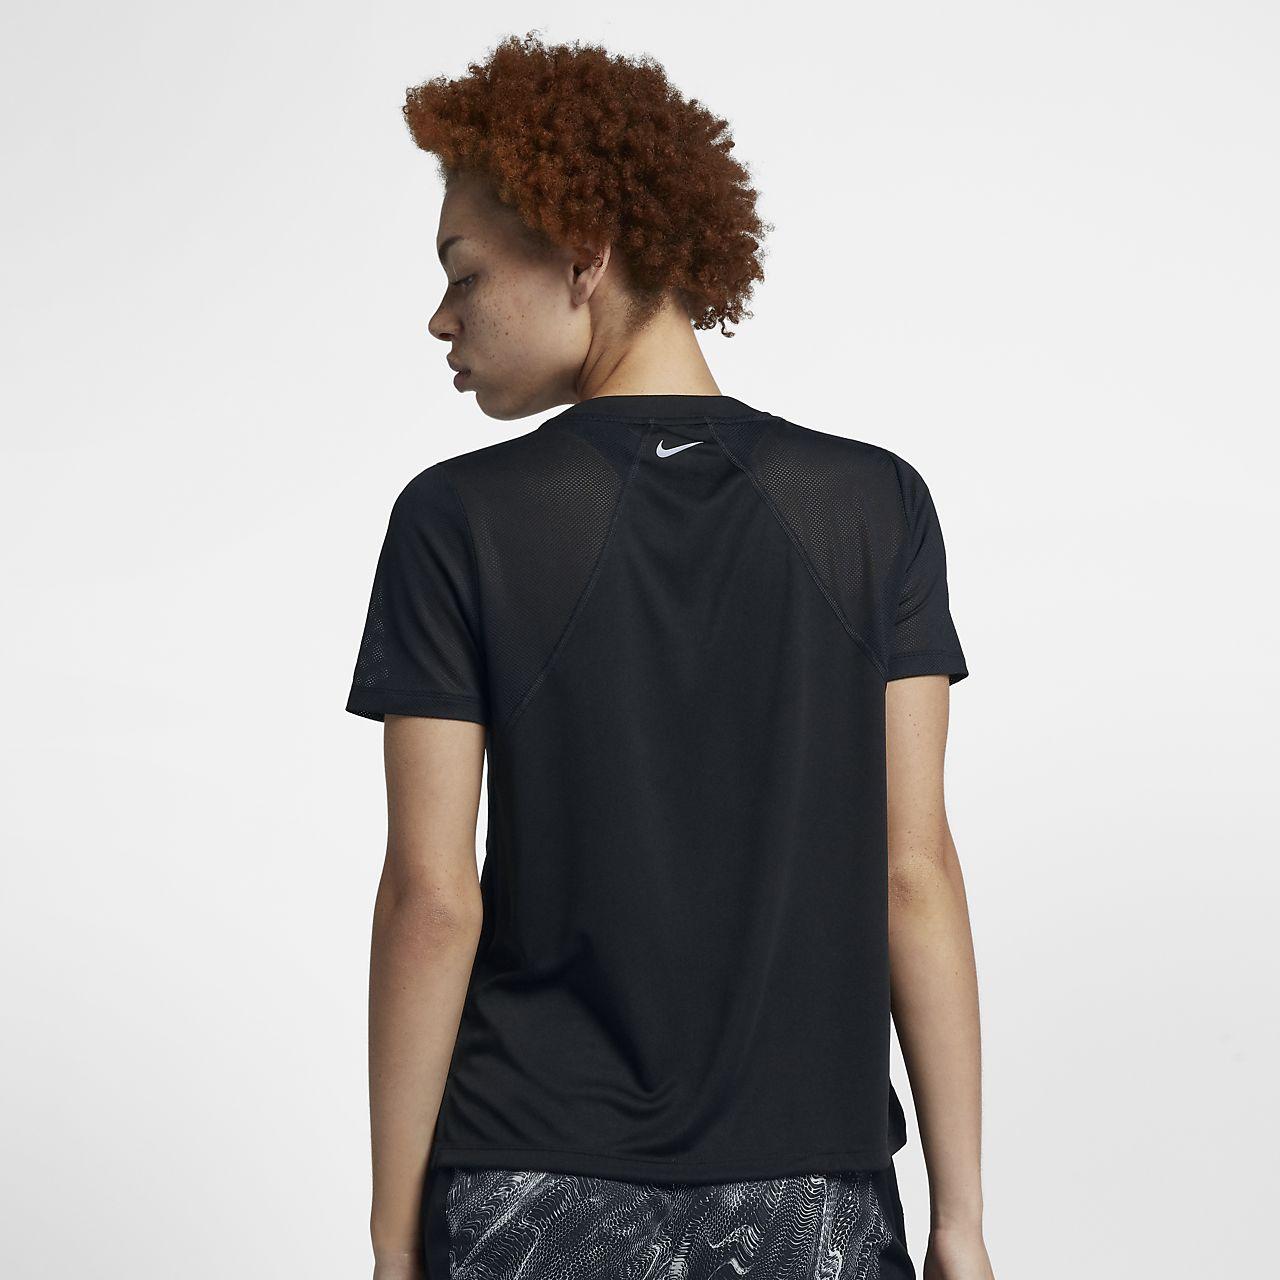 size 40 147cd 10c8a ... Nike Dri-FIT Miler Women s Short-Sleeve Running Top